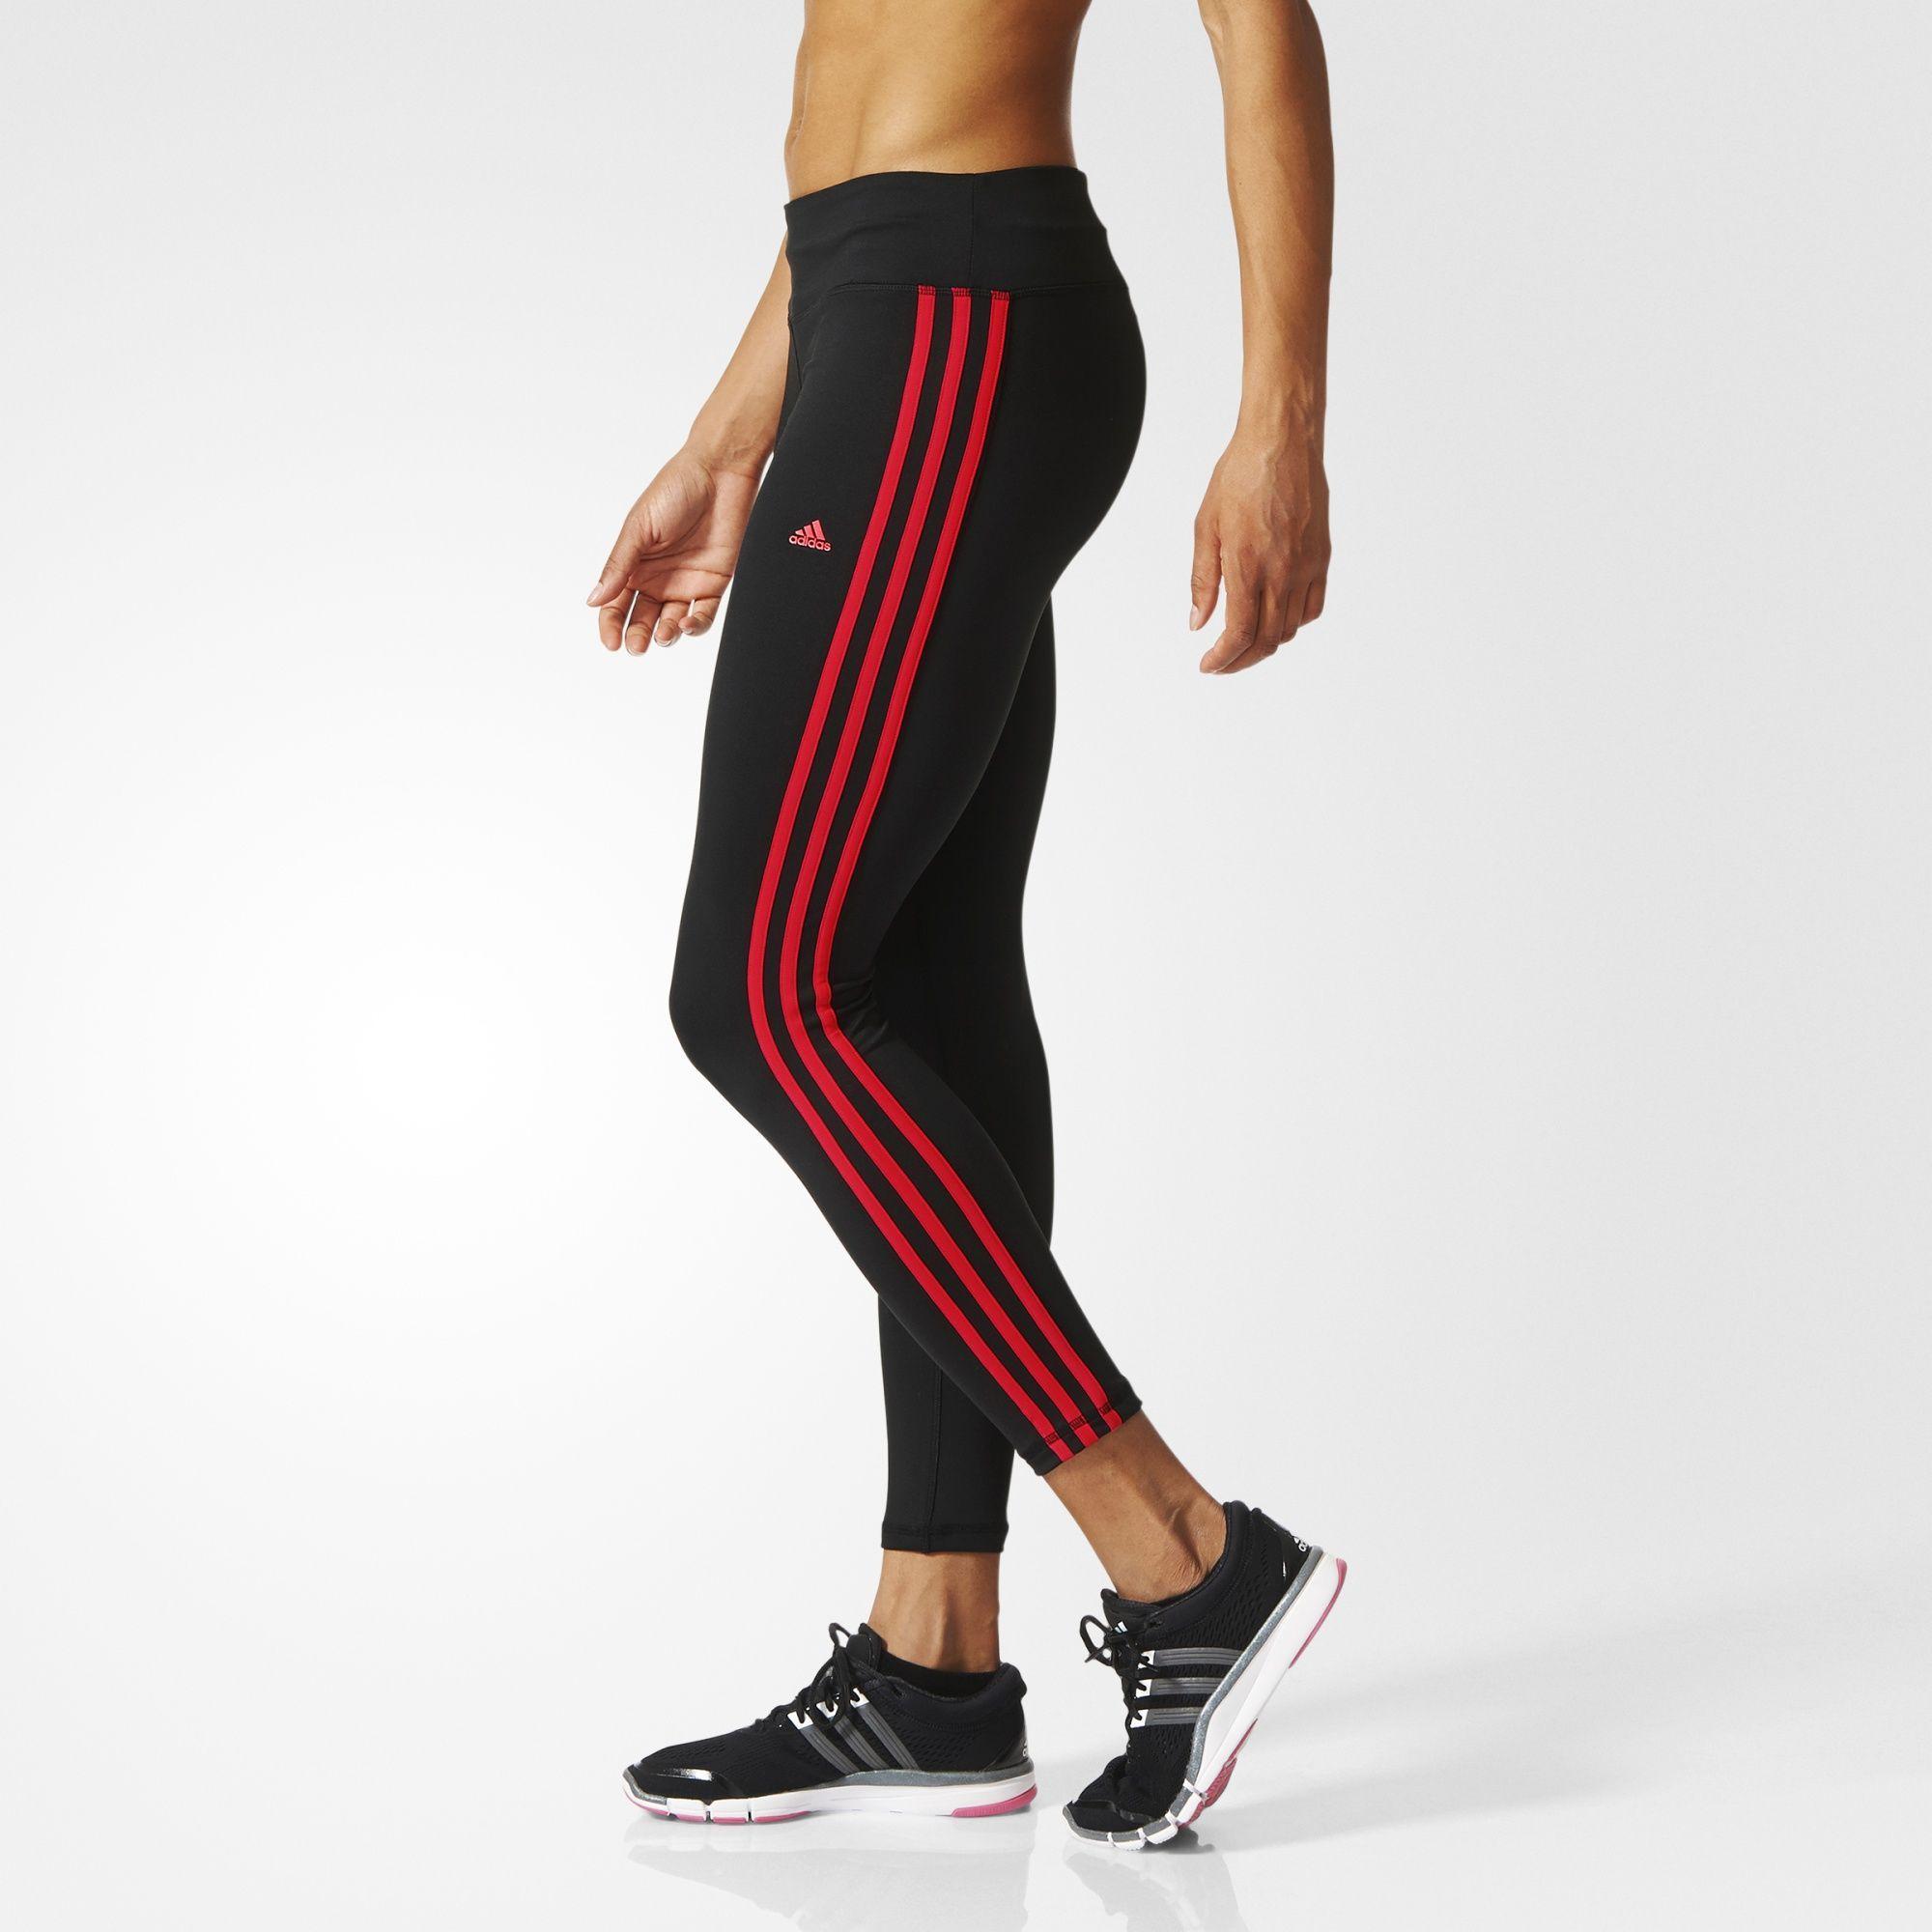 Women's Basic 3-Stripes Long Tights